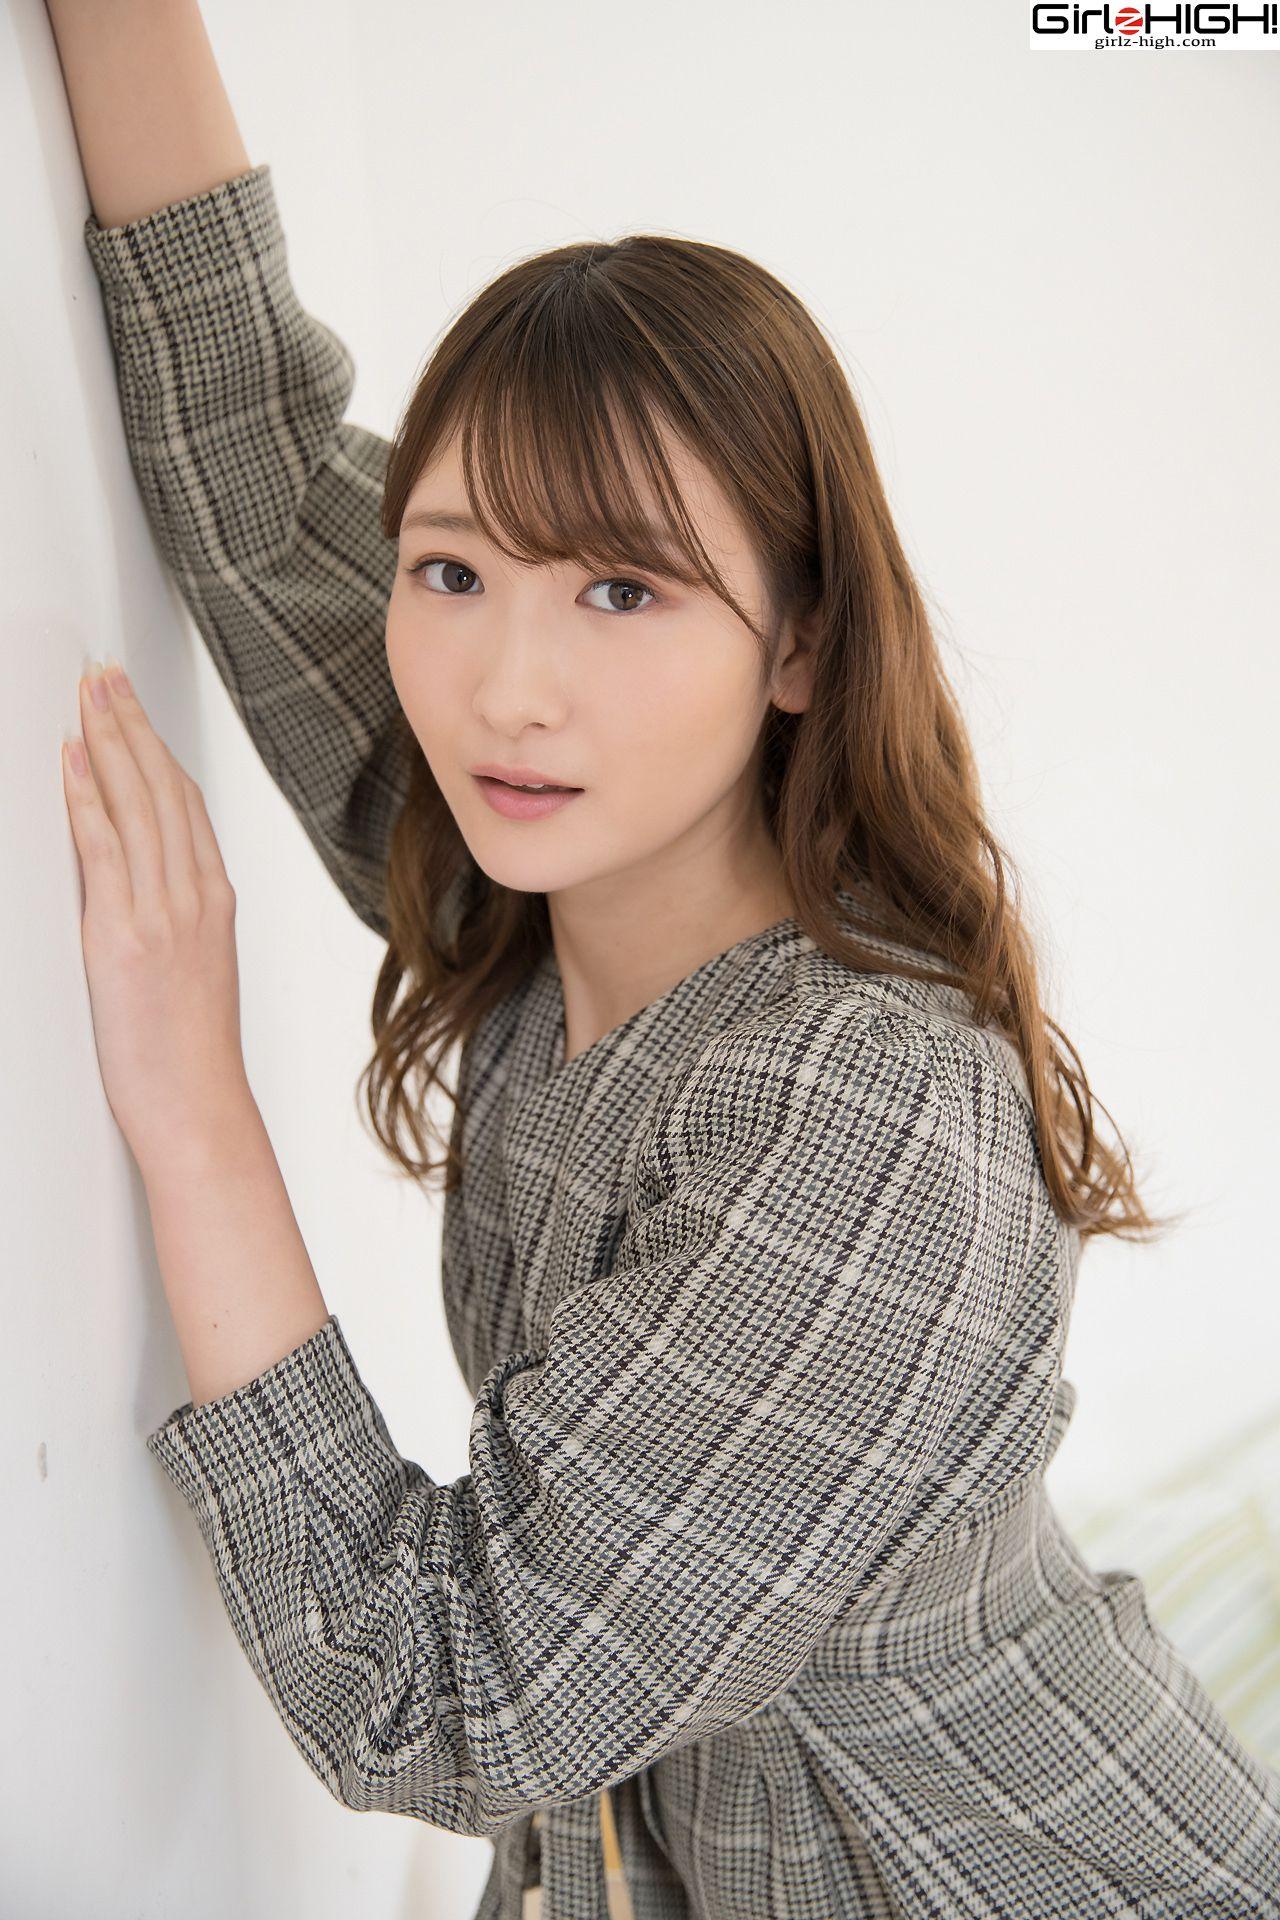 [Girlz-High]近藤麻美(近藤あさみ)超高清写真大图片(47P)|221热度